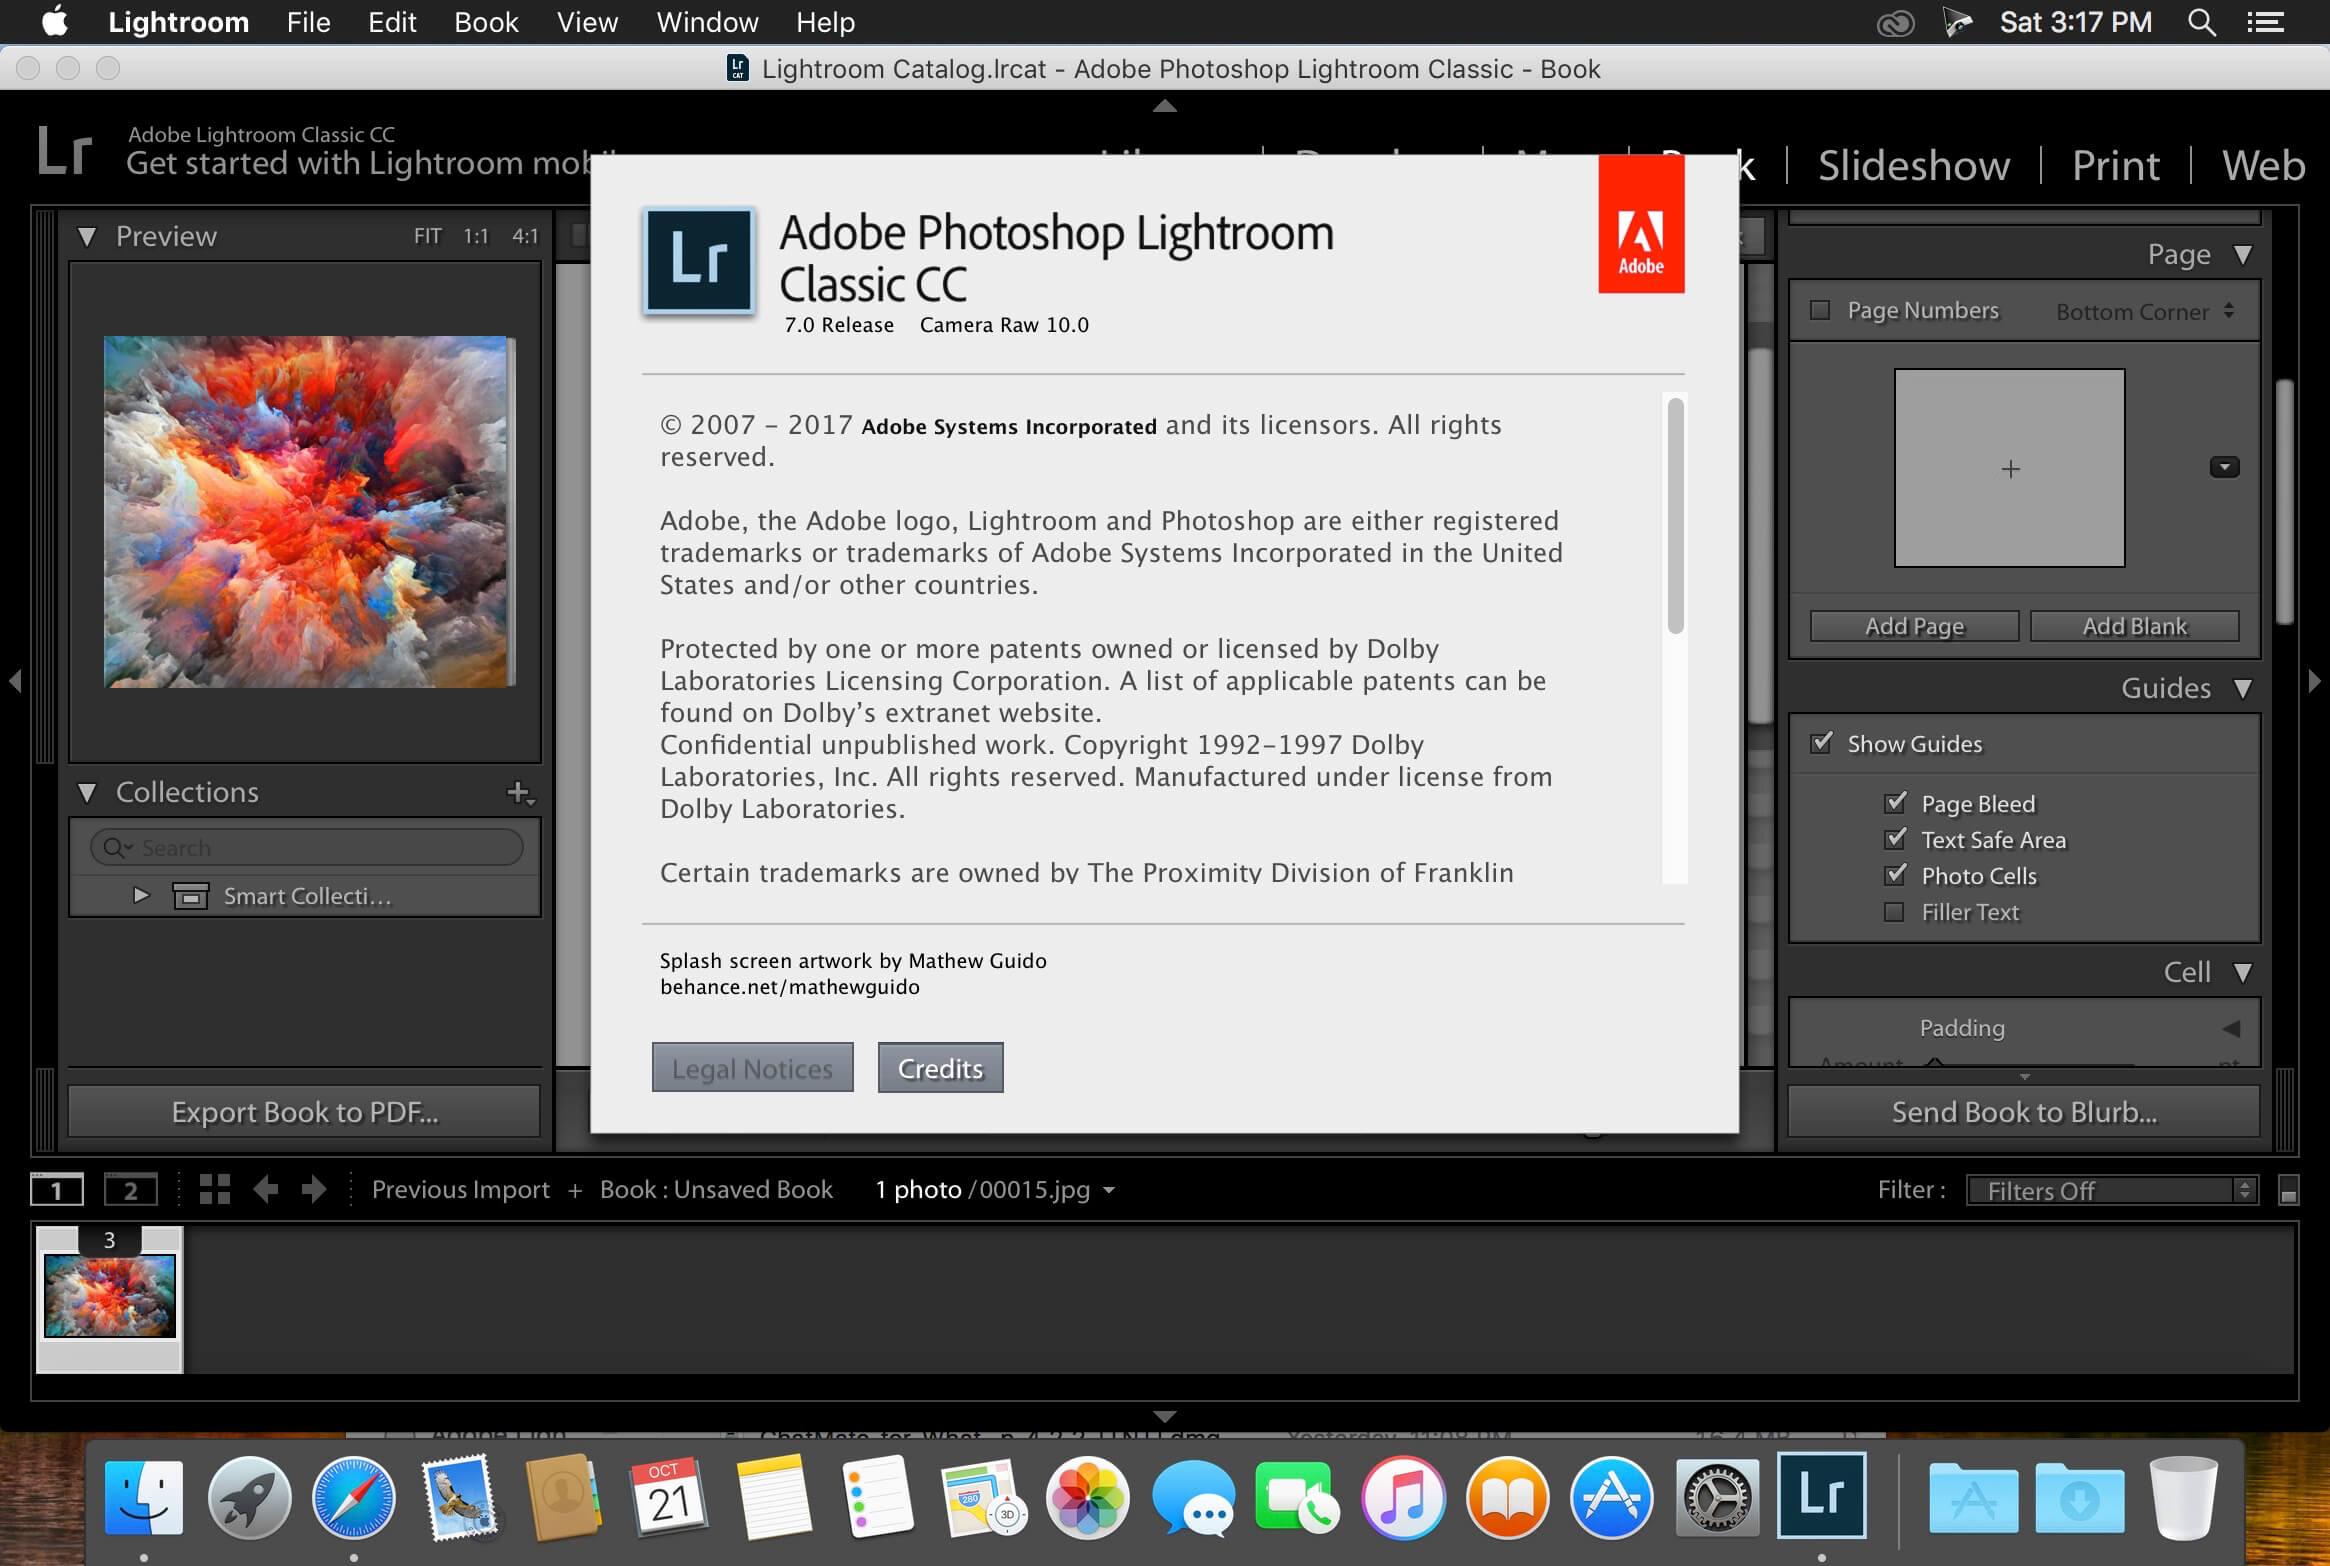 Adobe Photoshop Lightroom Classic CC 2018 v7 5 0 10 download | macOS